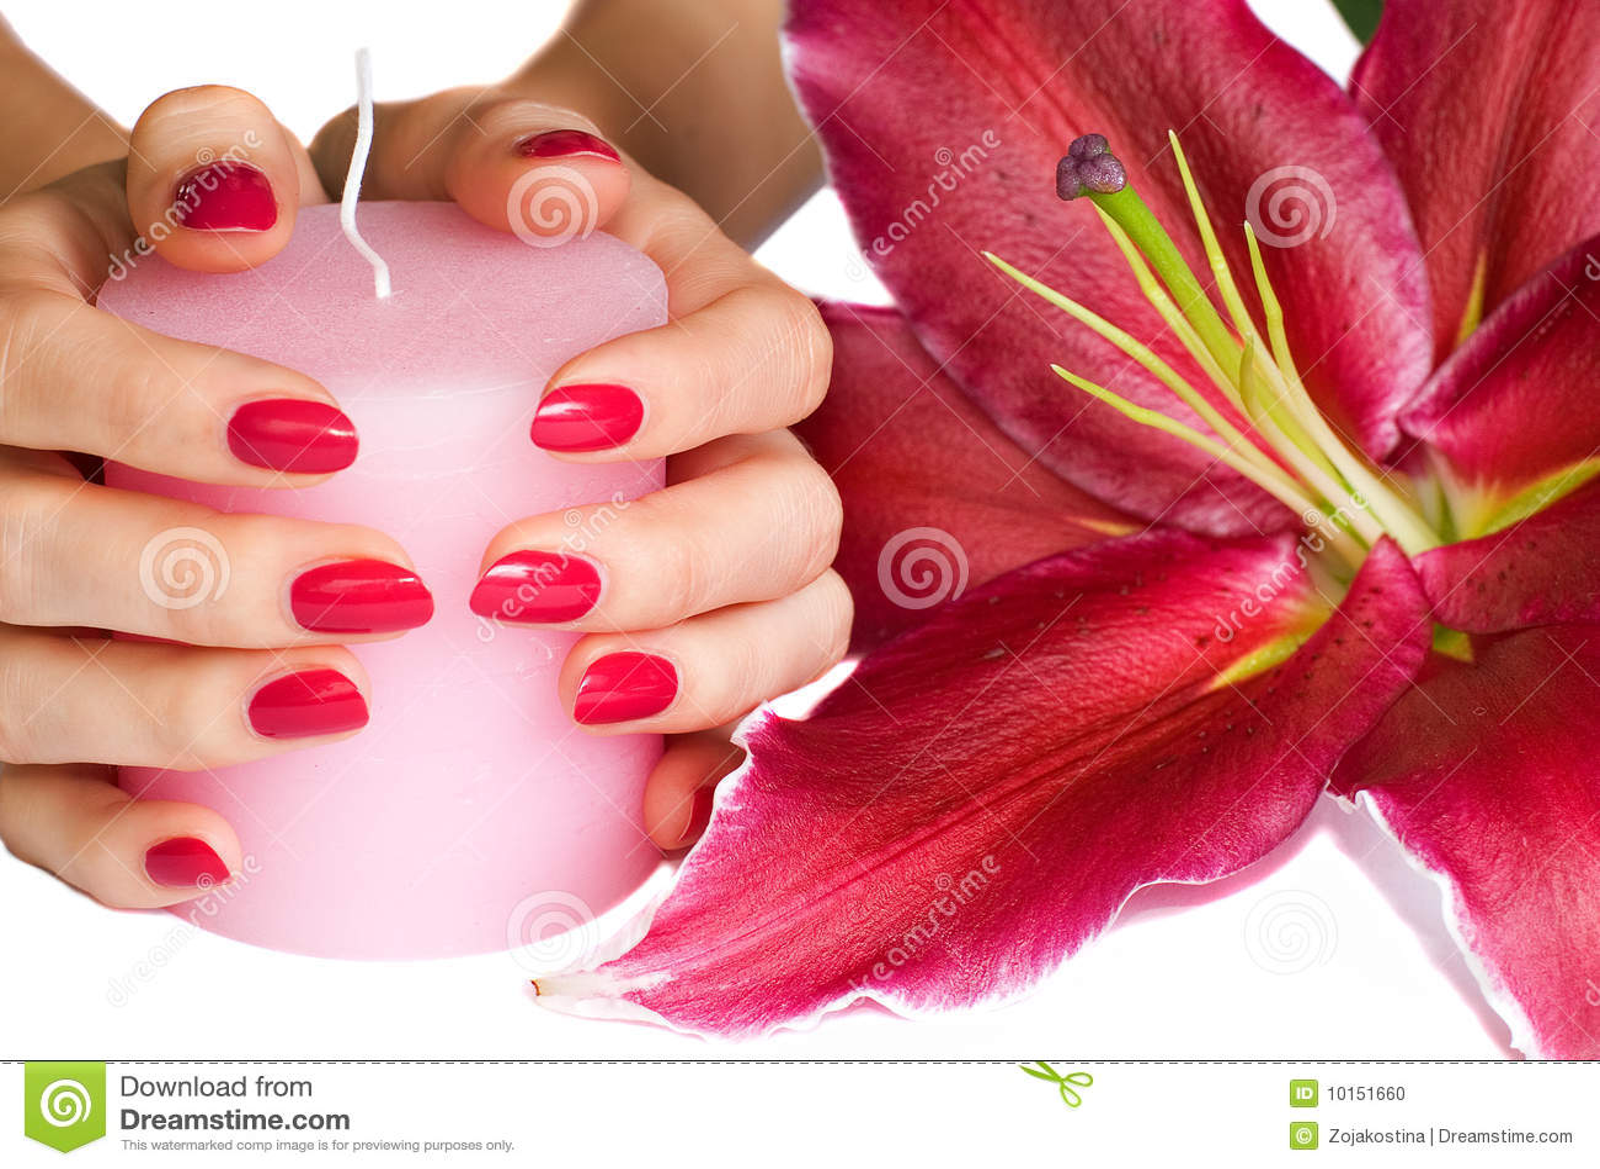 Perfect Manicure Nail Polish Woman Hands Stock Photo 443464984 ...